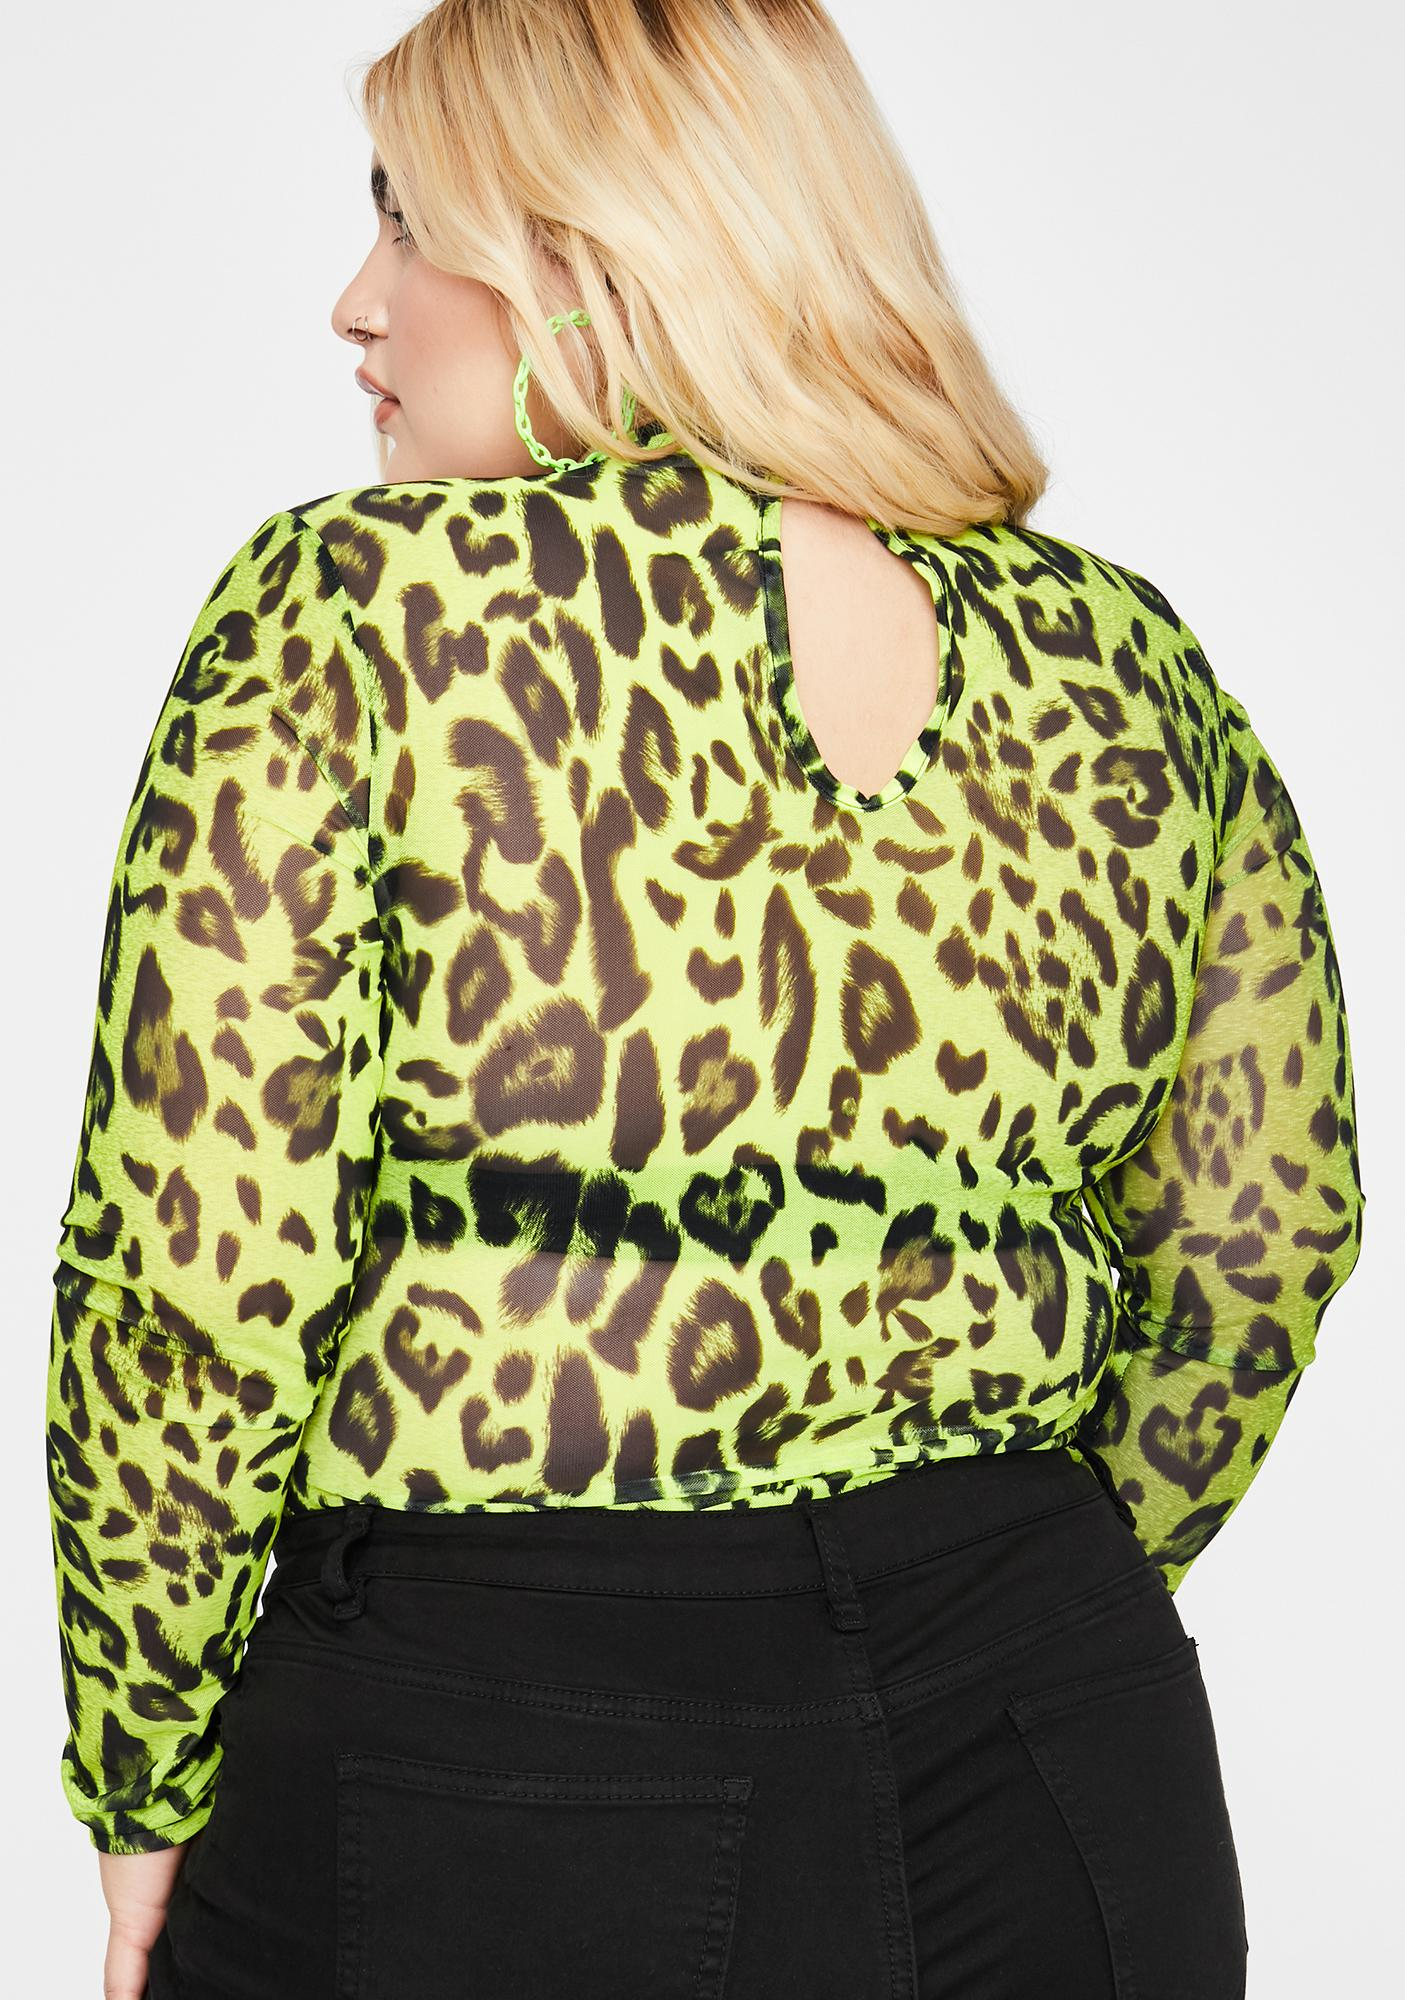 Wild Sonic Pounce Leopard Bodysuit